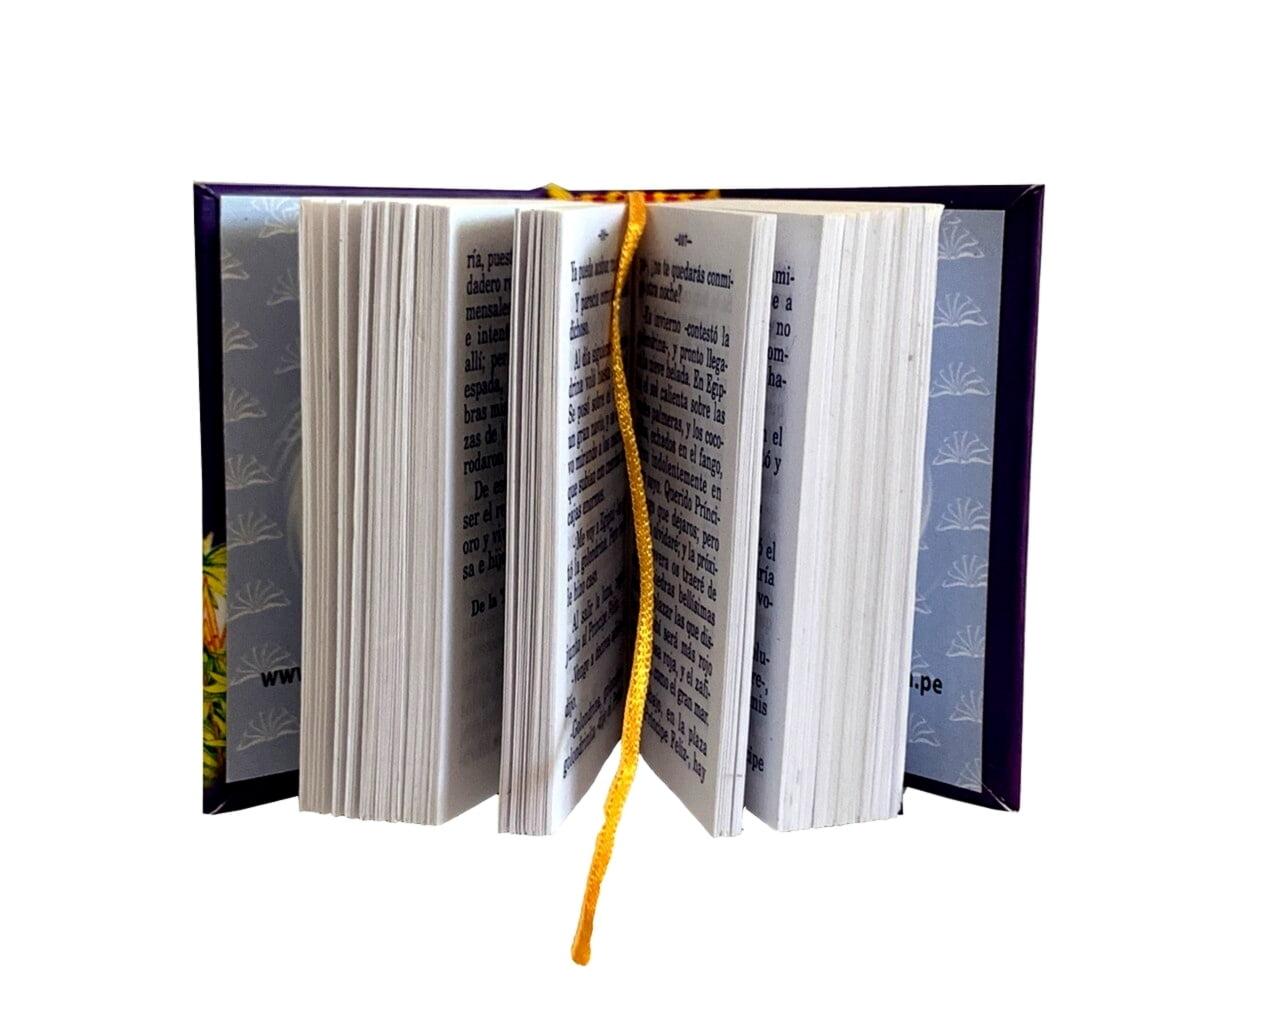 cuentos-clasicos-V-1-miniature-book-libro